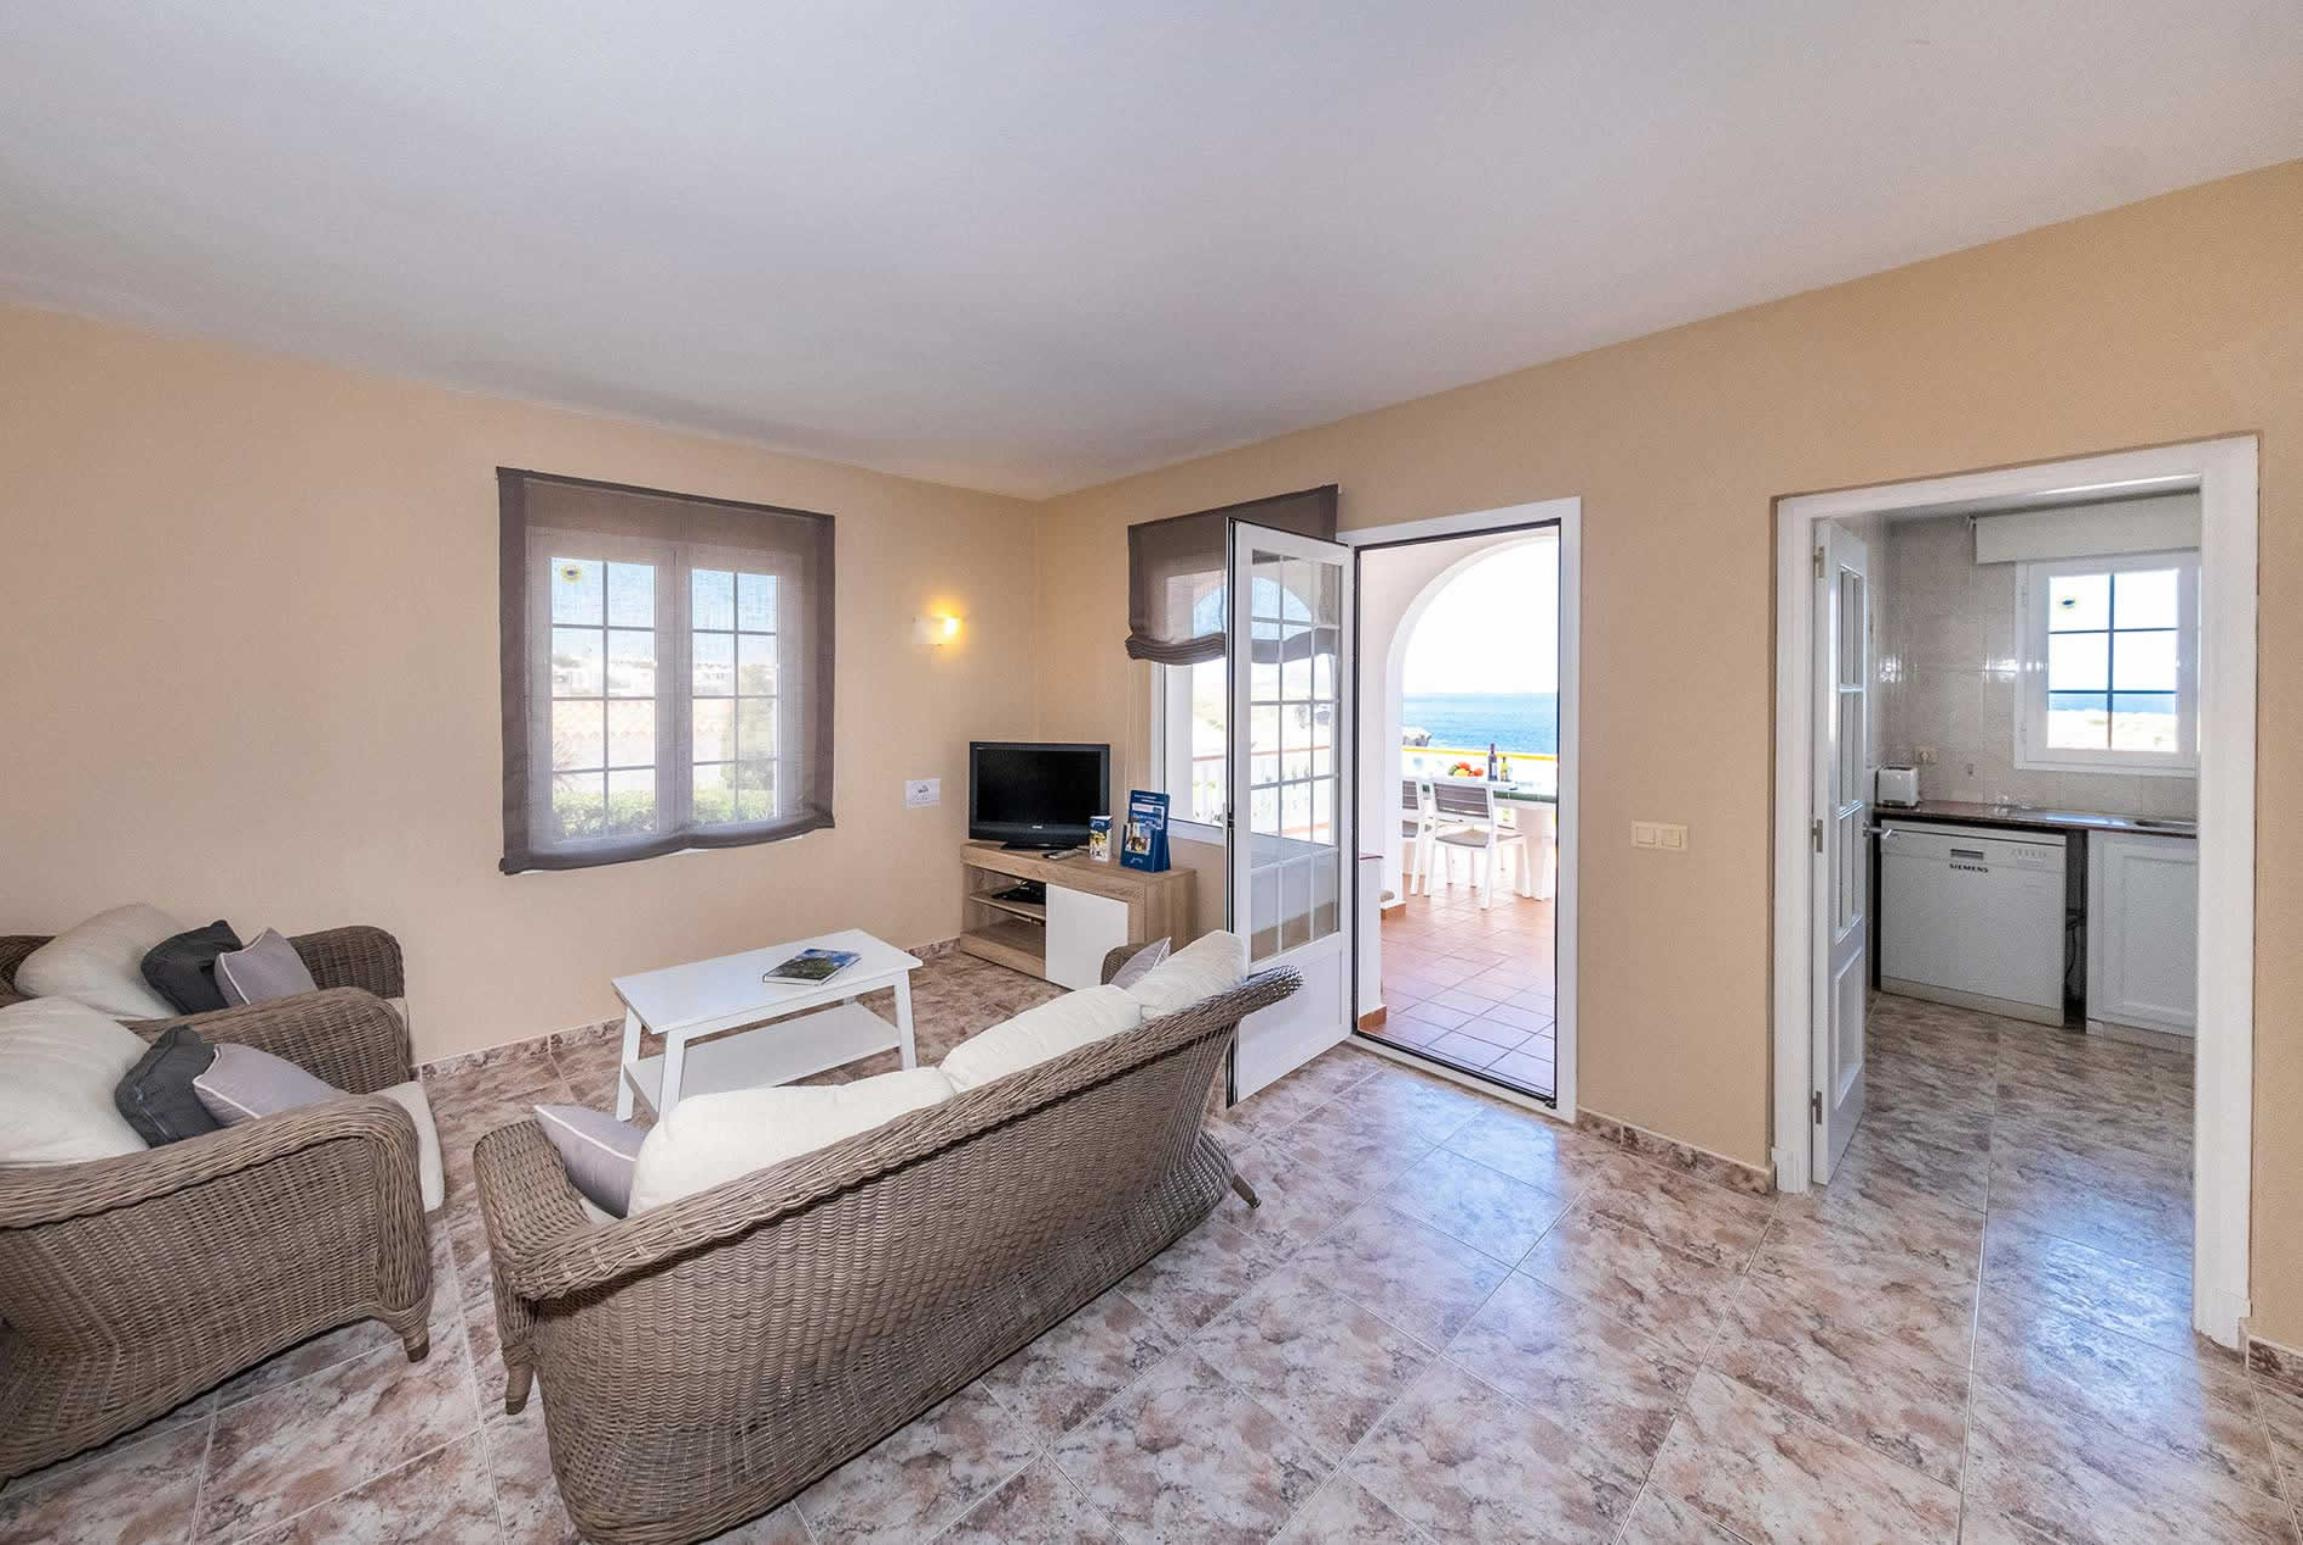 Ferienhaus Bellavista I (2654269), Arenal De'N Castell, Menorca, Balearische Inseln, Spanien, Bild 23